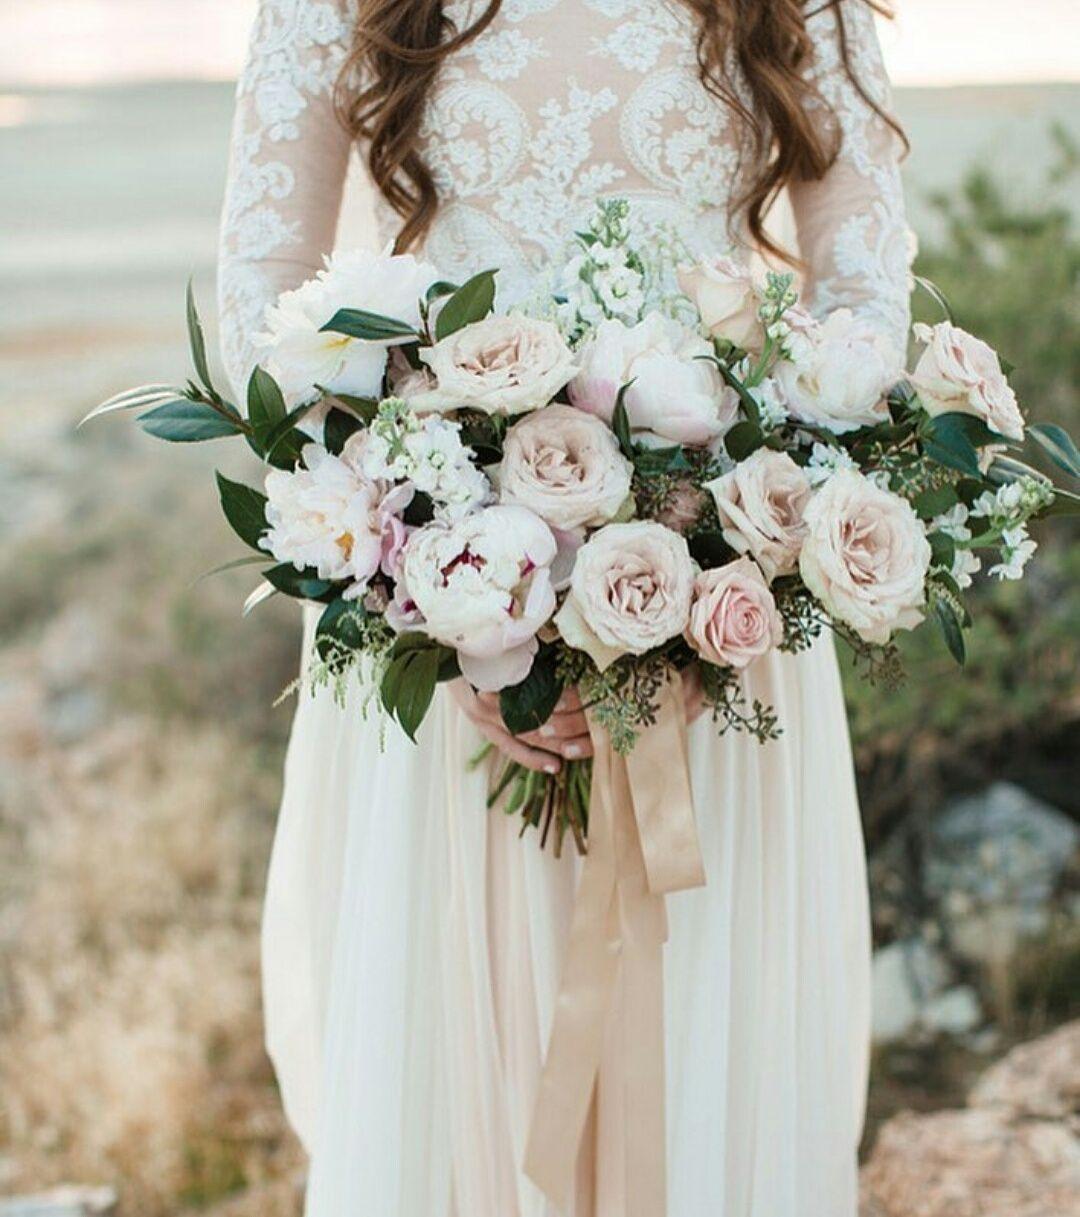 Modest long sleeve lace wedding dresses  modest wedding dress with long sleeves from alta moda modest